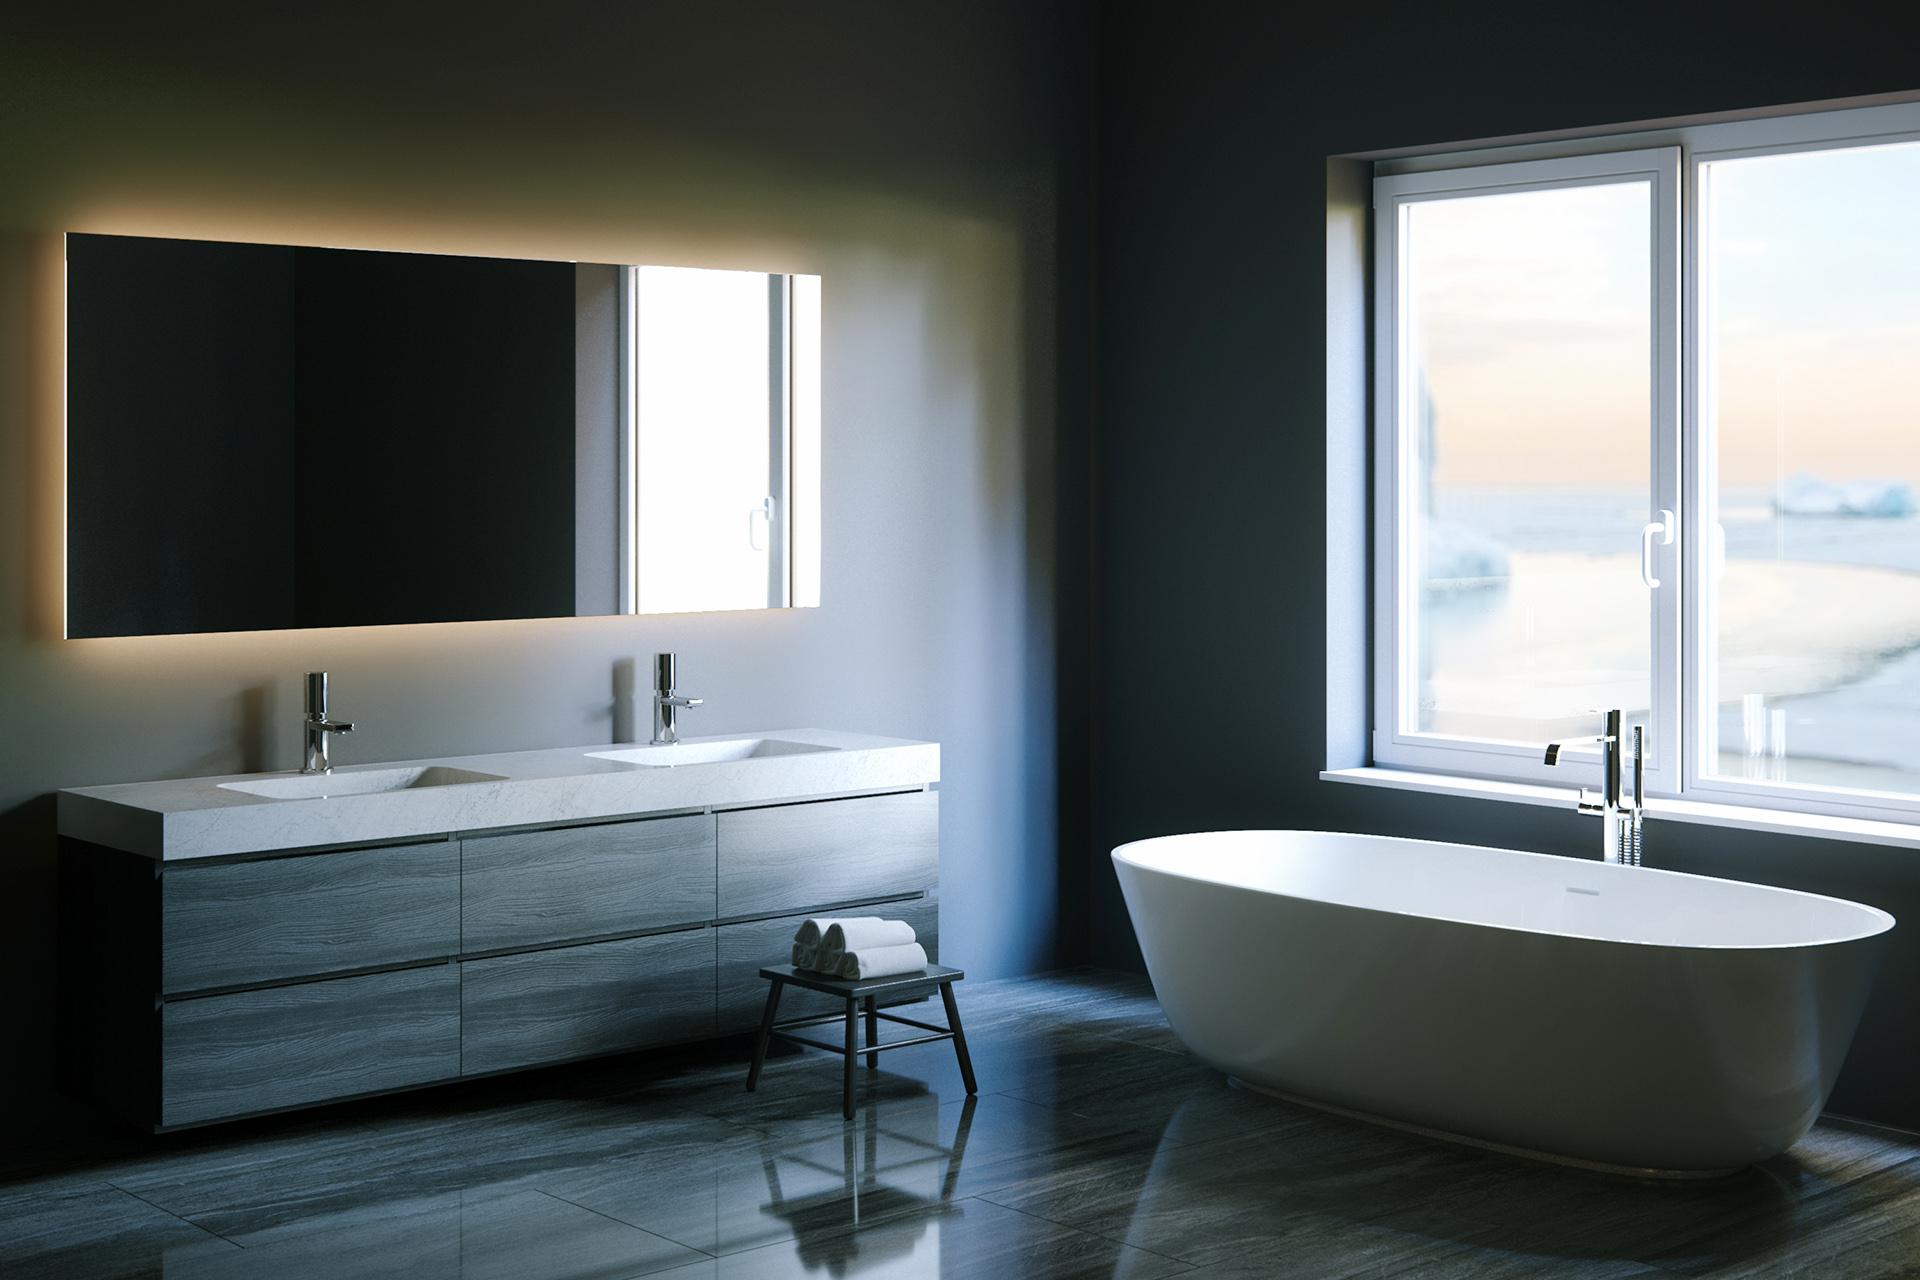 Festpreisbad Badideen Dunkles Bad mit Wandbeleuchtung 26